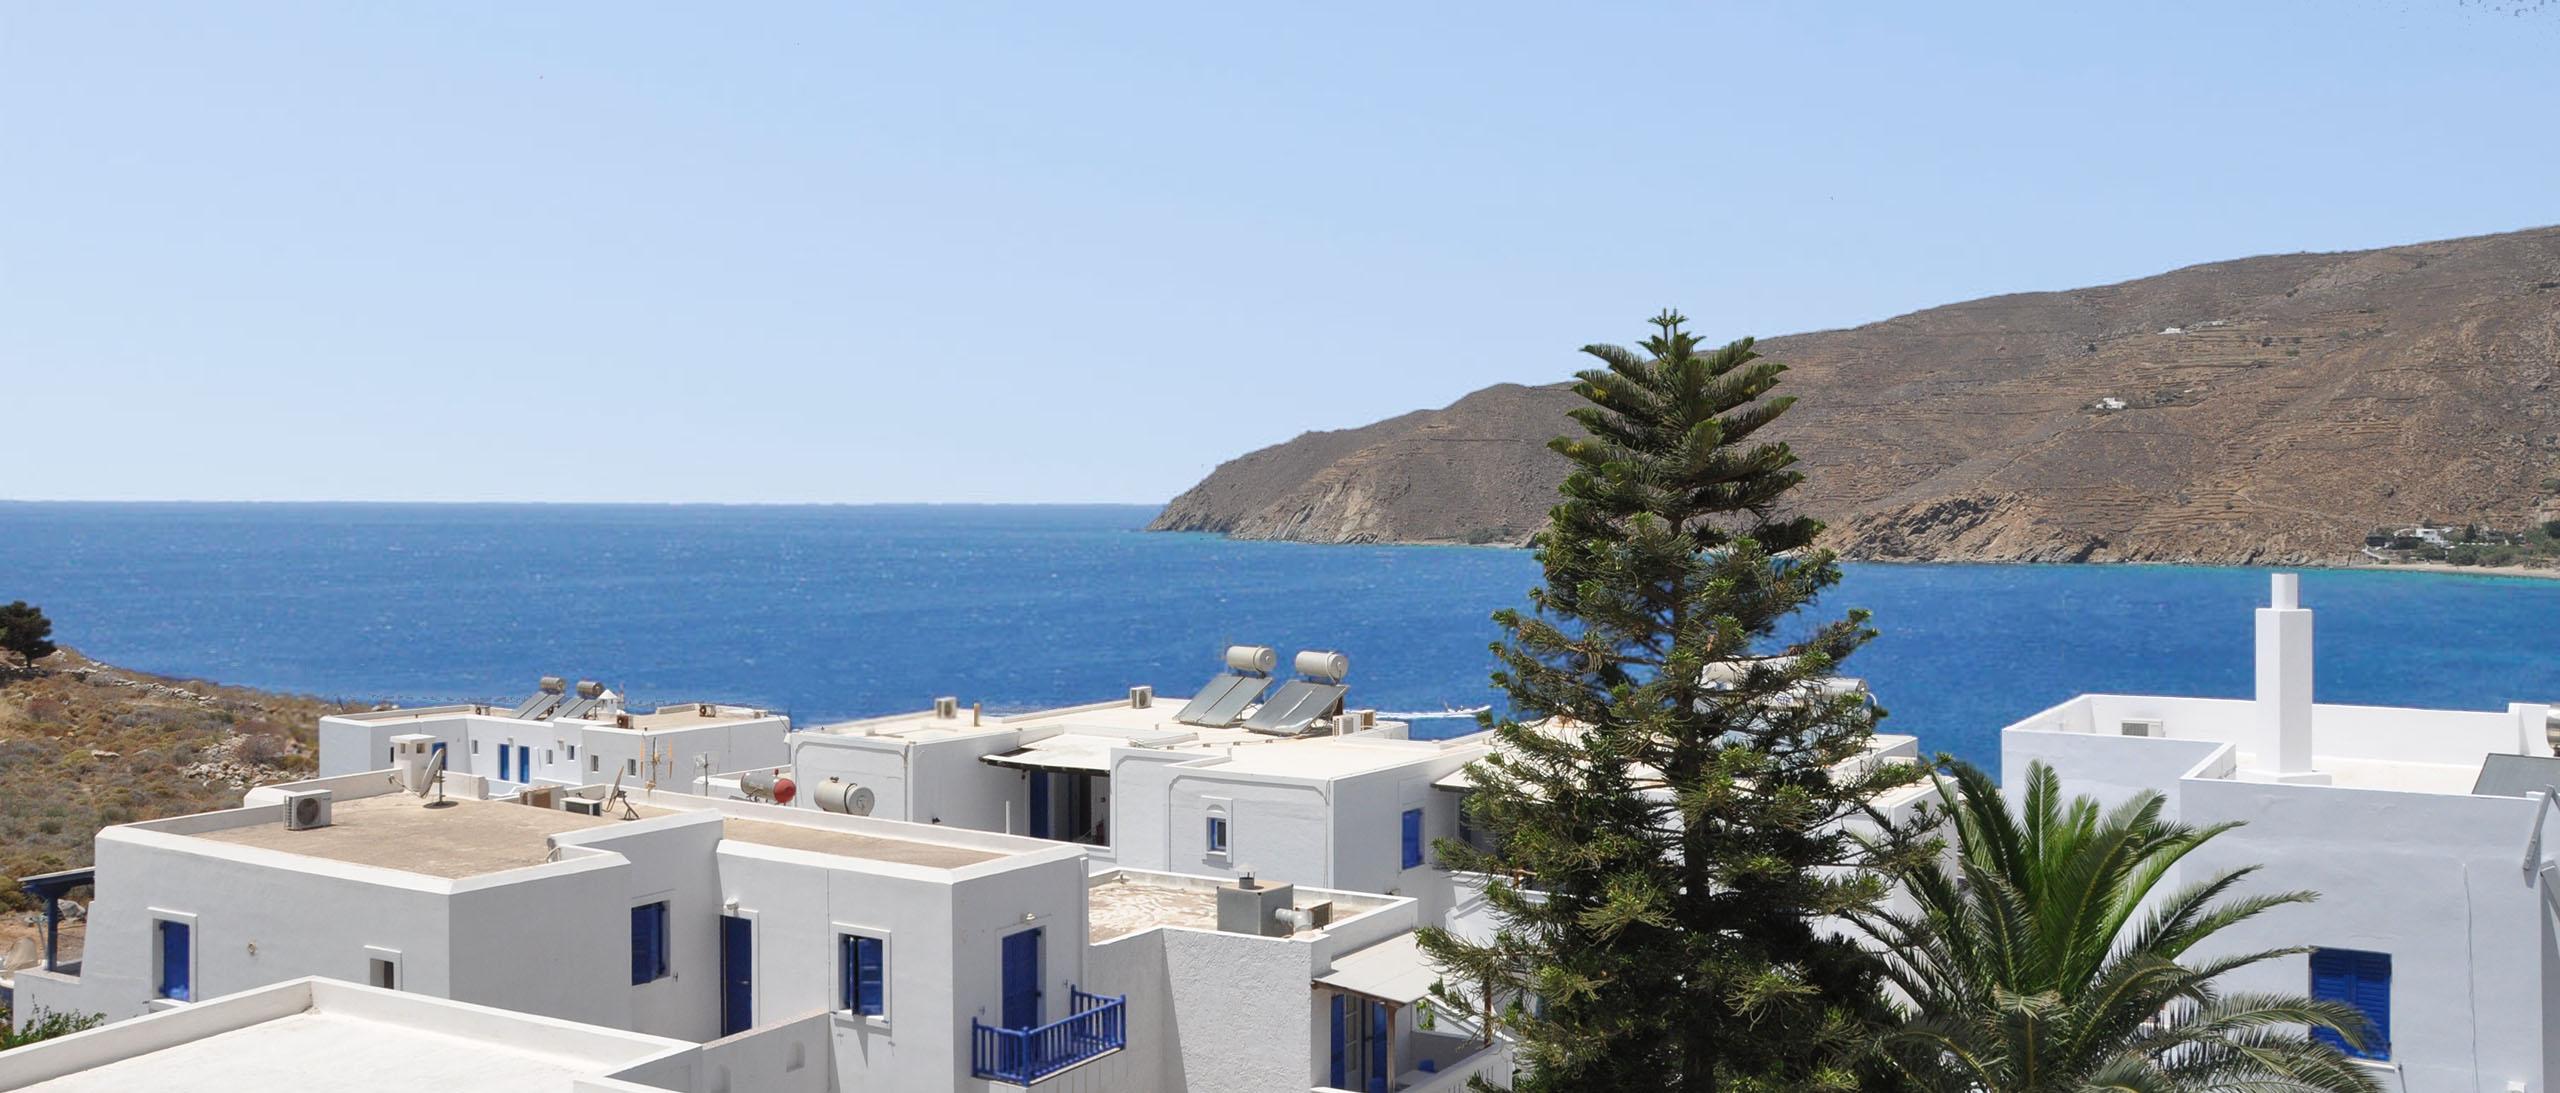 Accommodation Studios Akrogiali Amorgos Greece